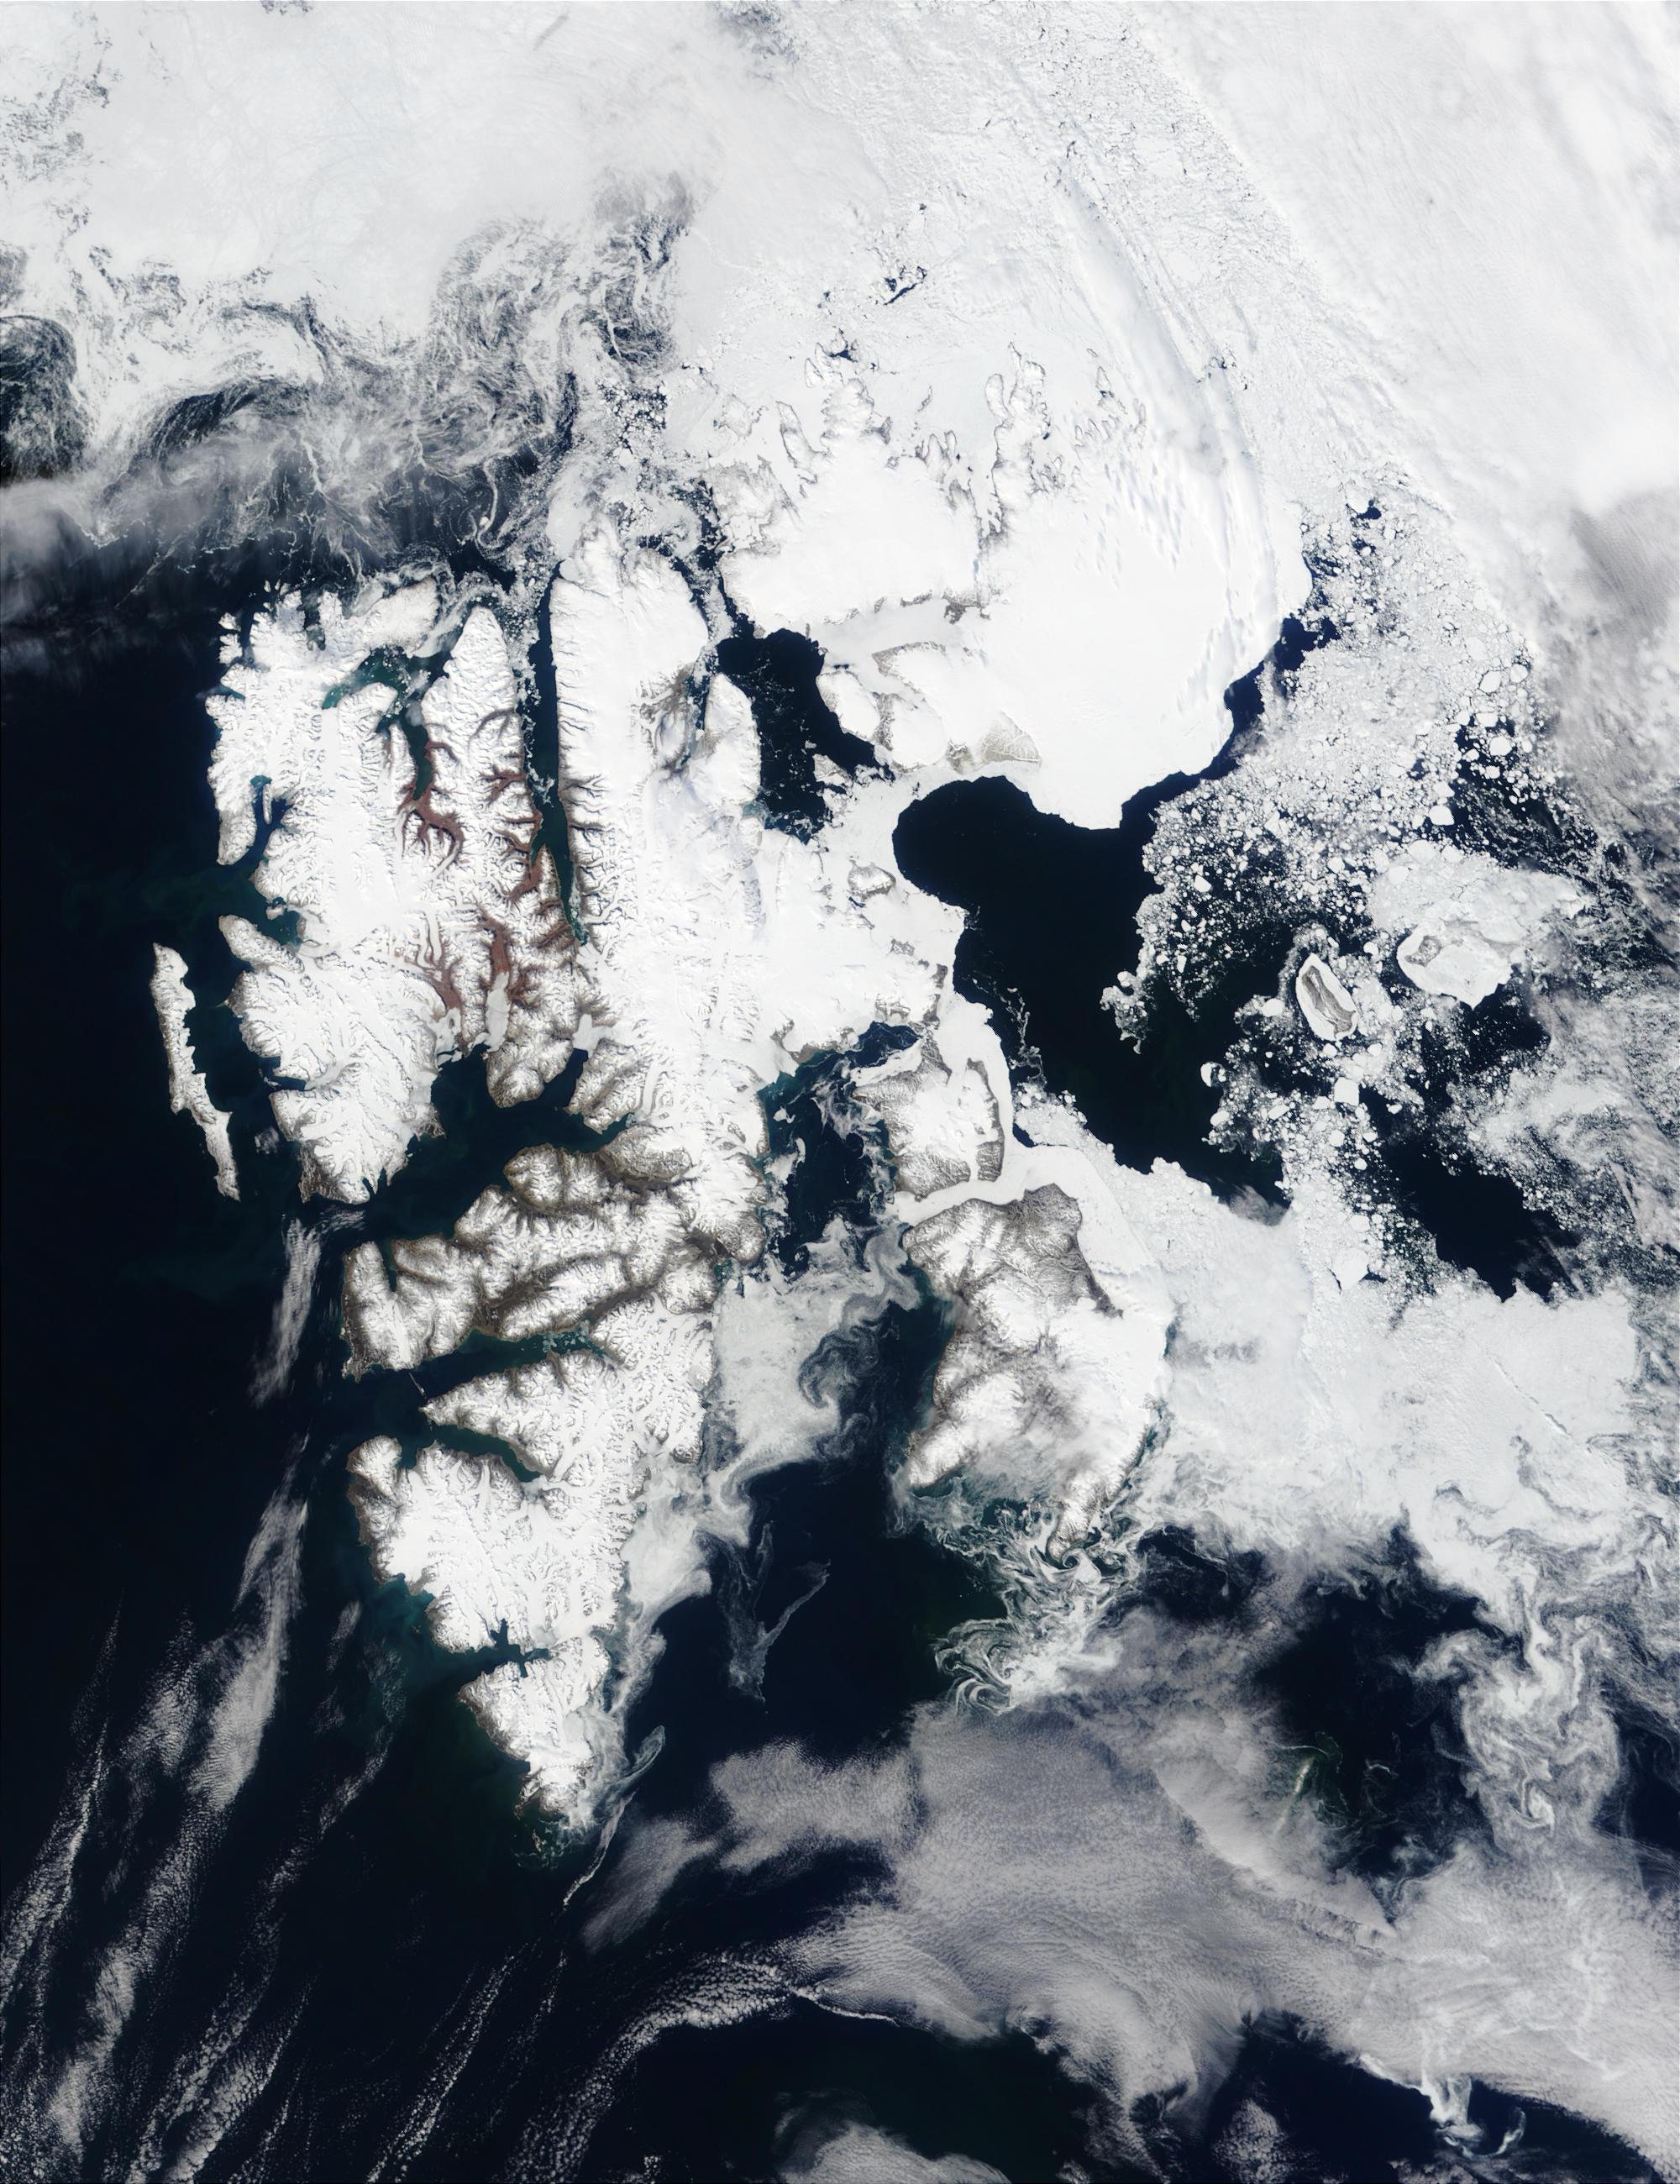 Svalbard, Arctic Ocean